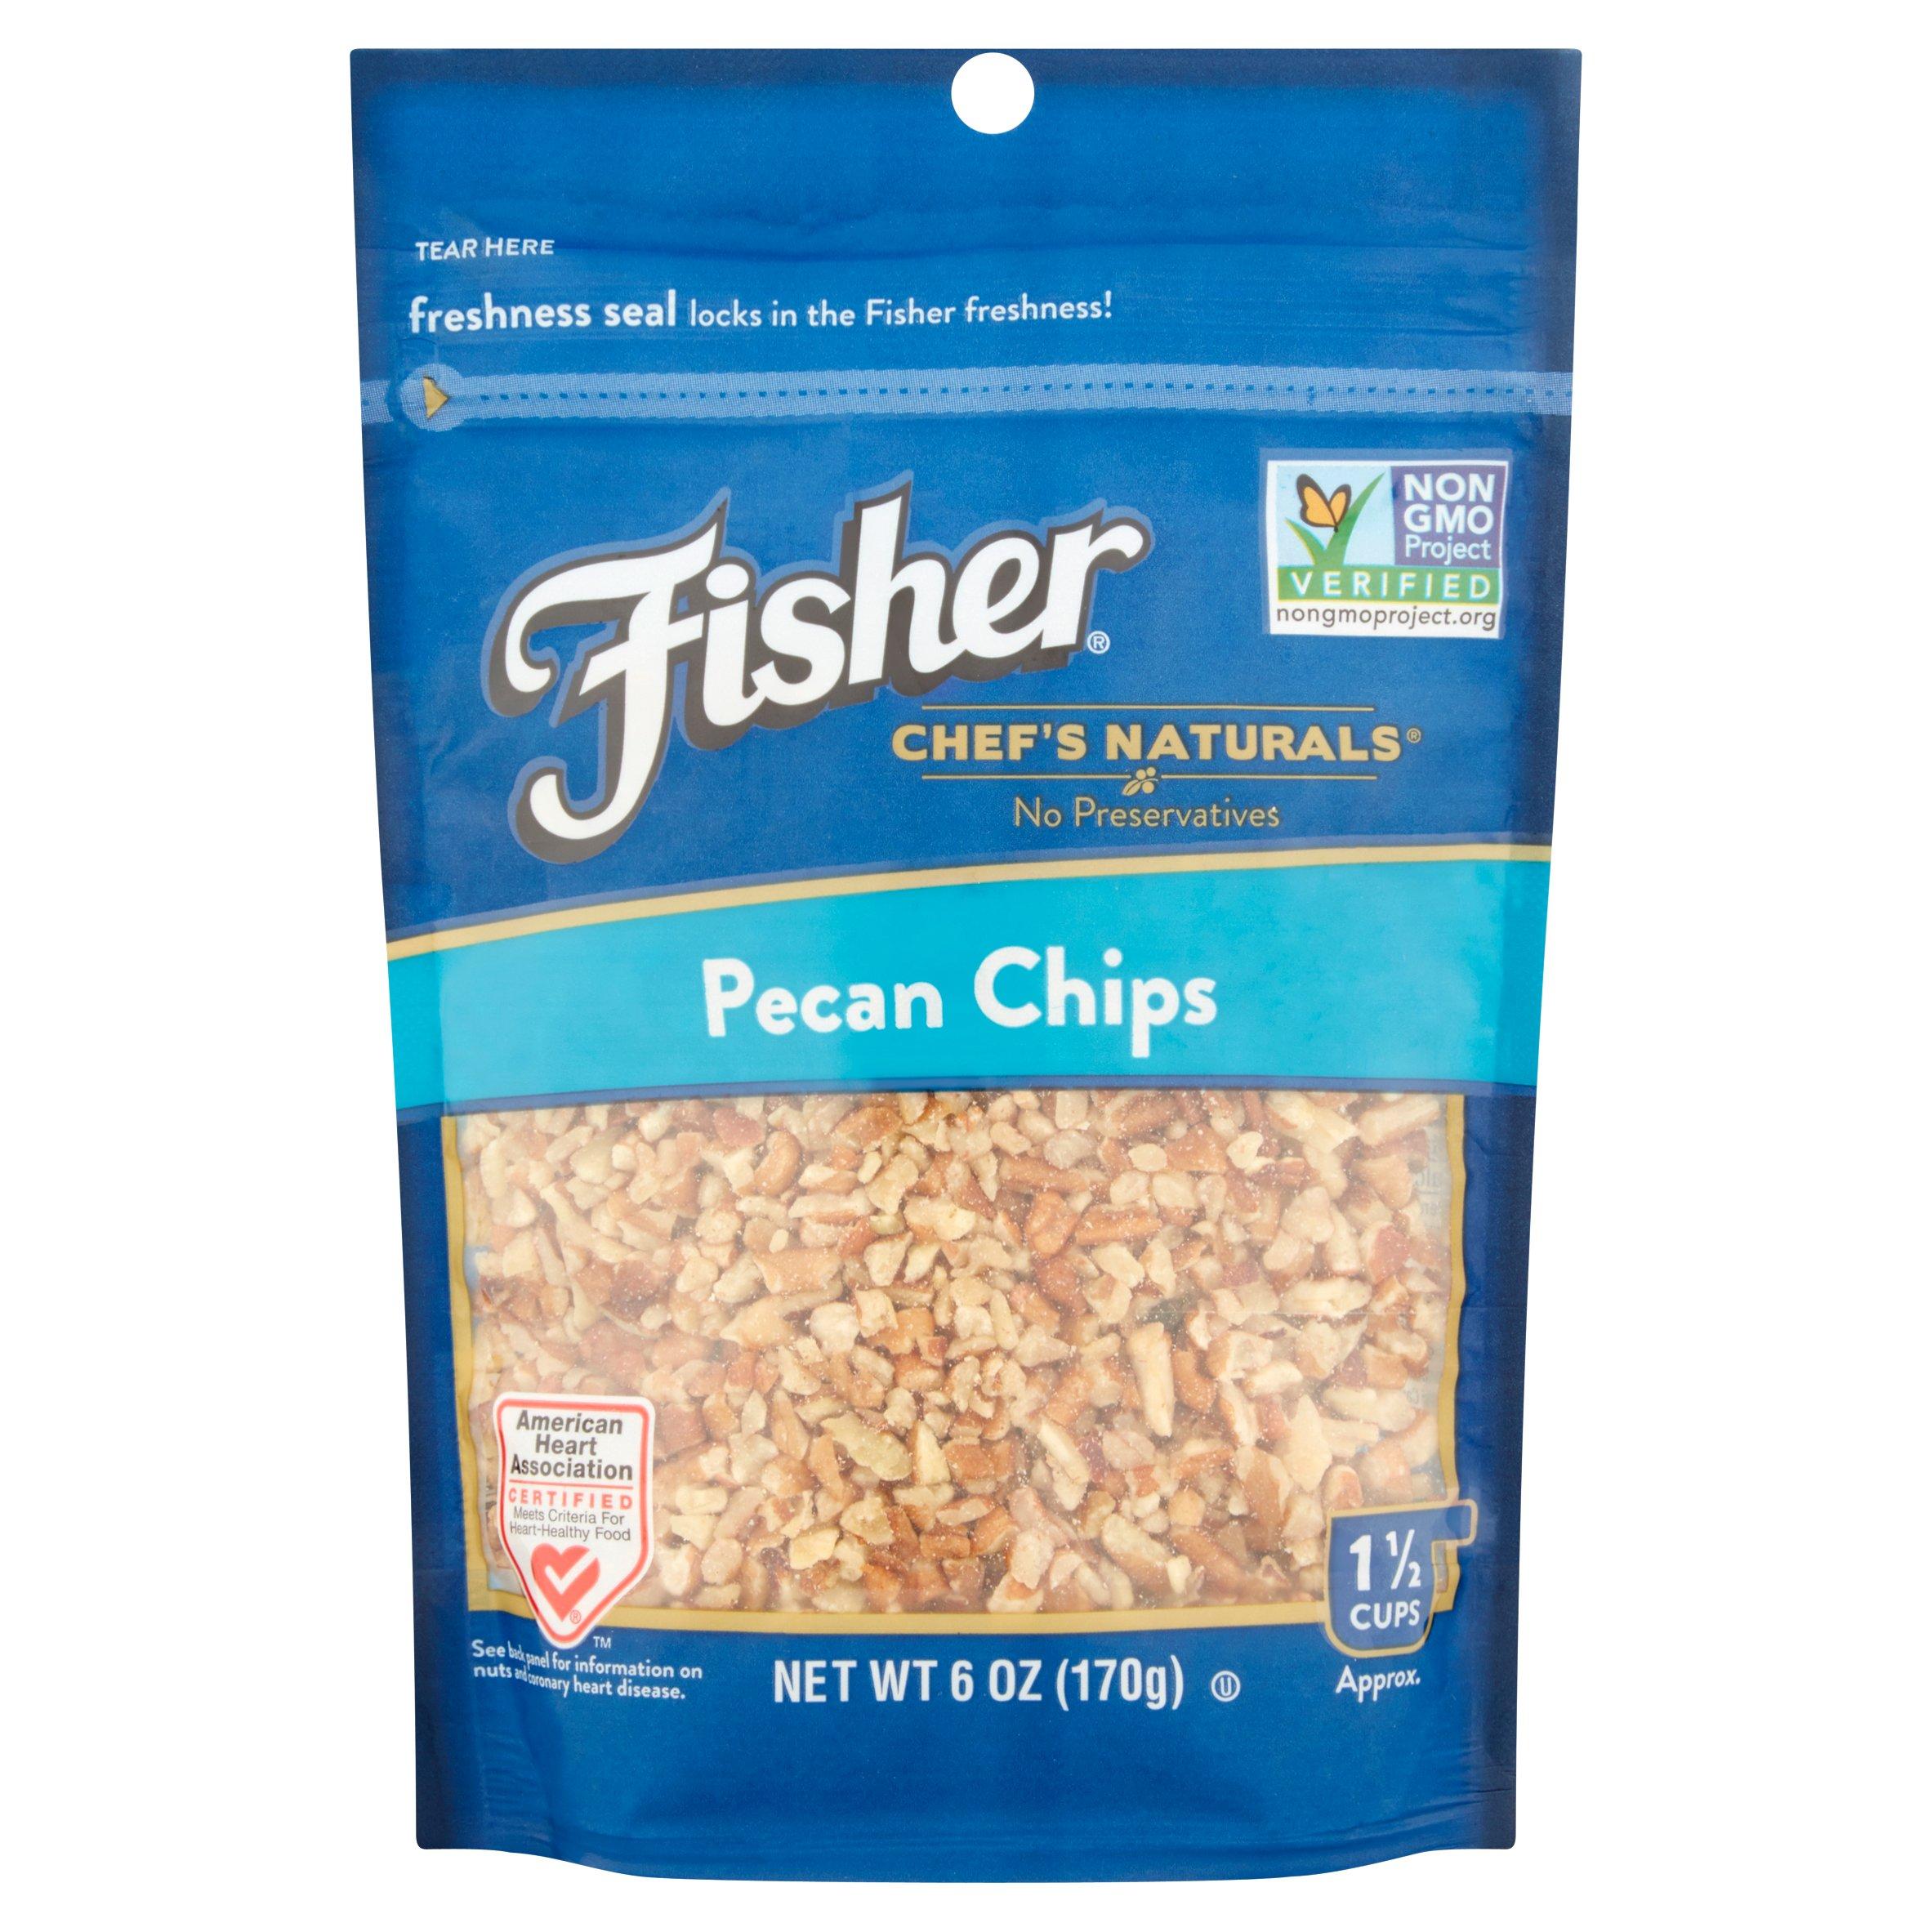 Fisher Chef\'s Naturals Natural Sliced Almonds, 24 Oz - Walmart.com